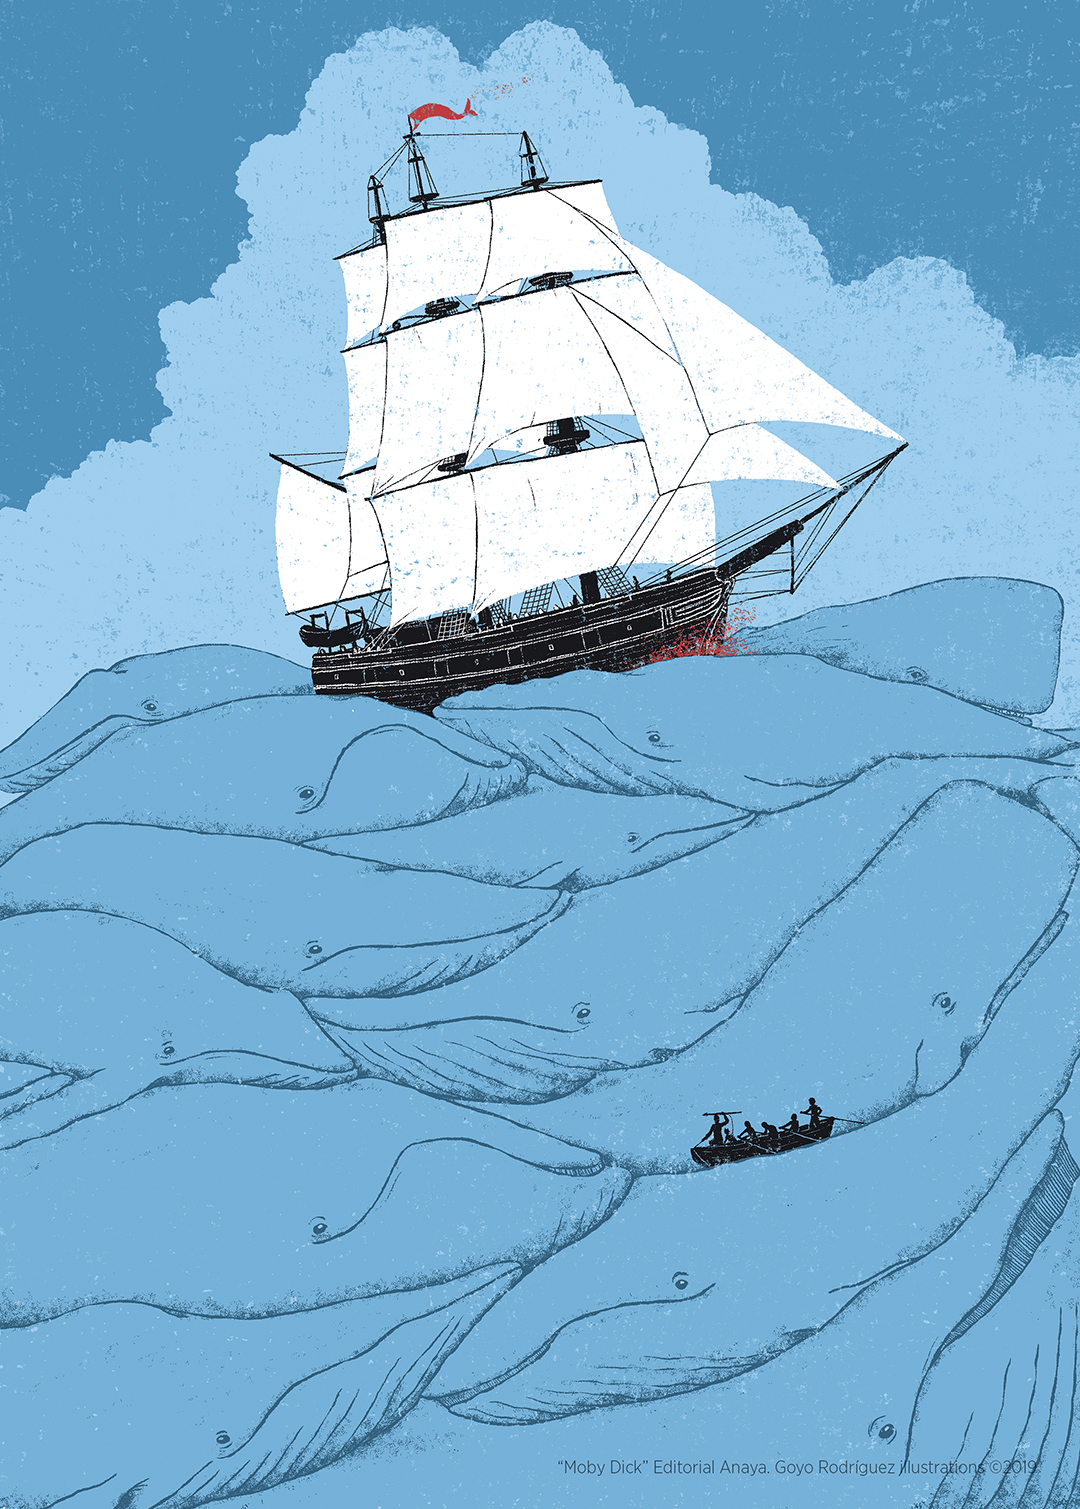 Loveblood -Goyo Rodriguez - Moby Dick_01.jpg